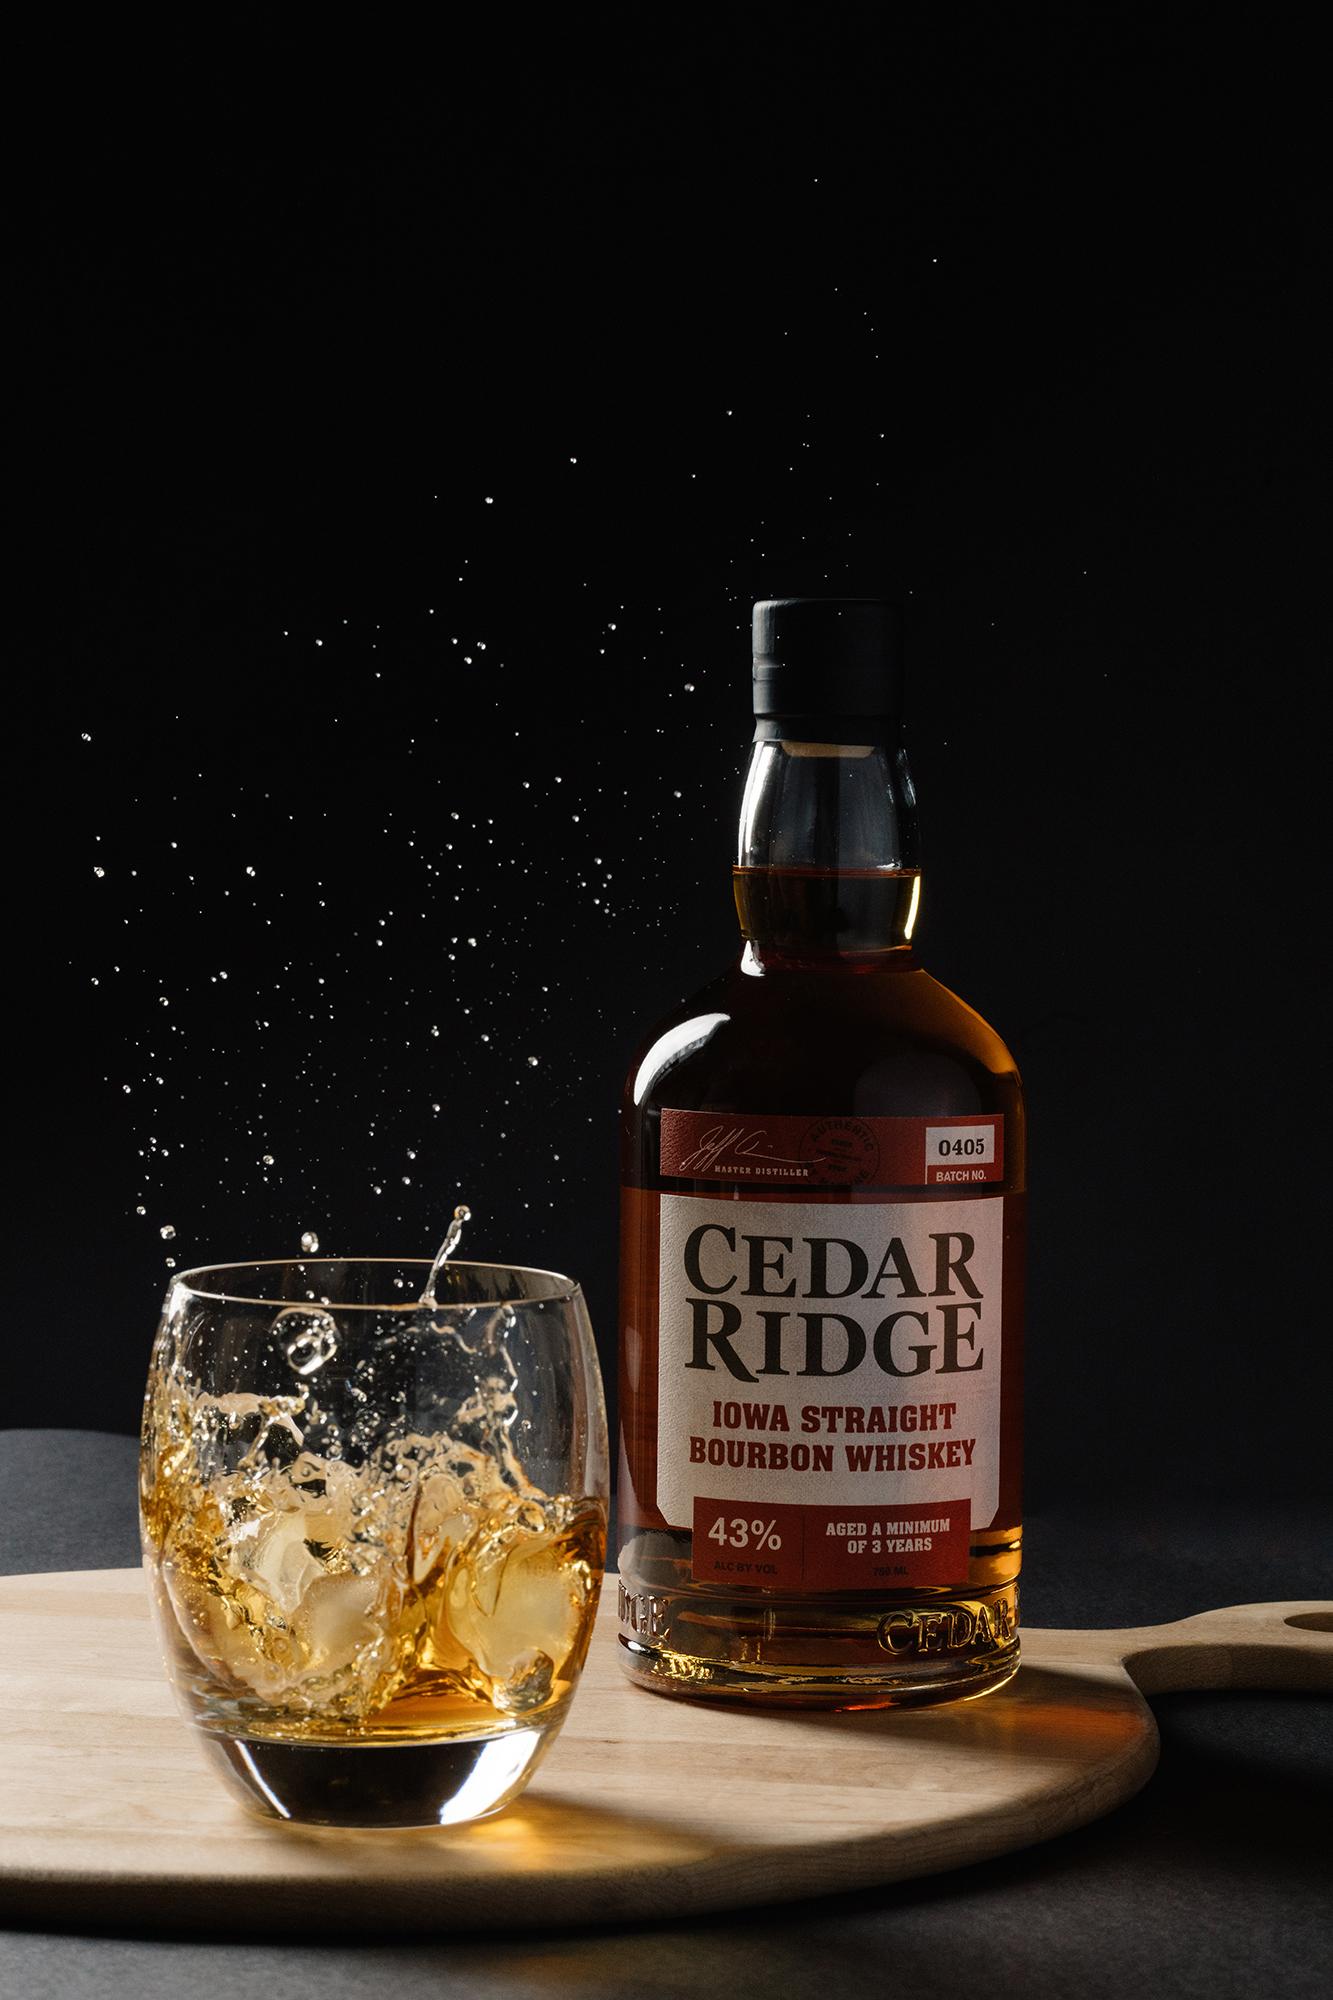 cedar ridge winery bourbon pouring into glass in the snow cedar rapids iowa